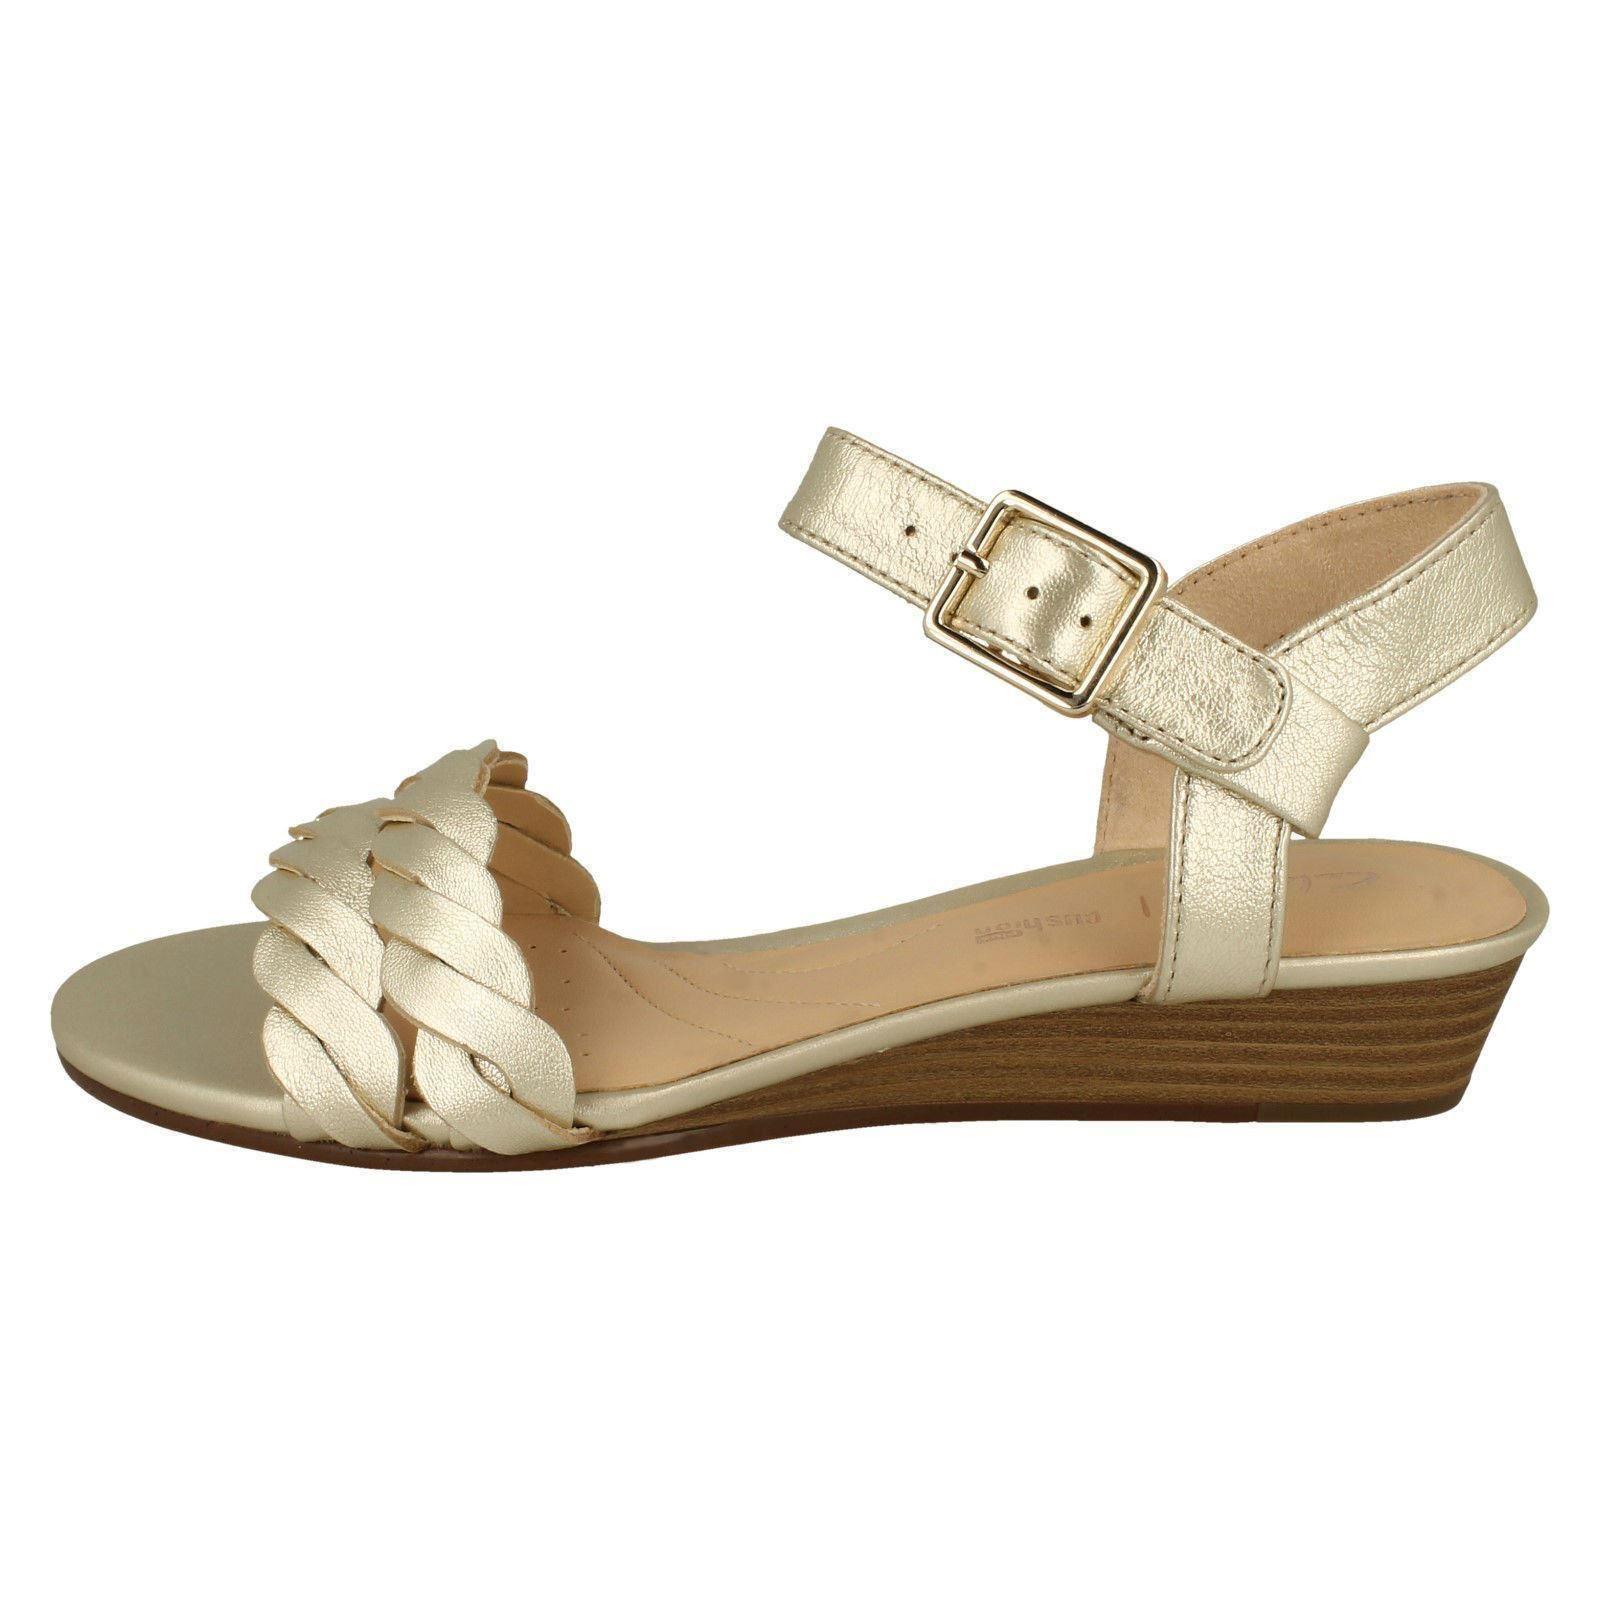 Ladies Clarks Stylish Open Toe Buckled Wedge Wedge Wedge Heeled Leather Sandals Mena Blossom f5aadb